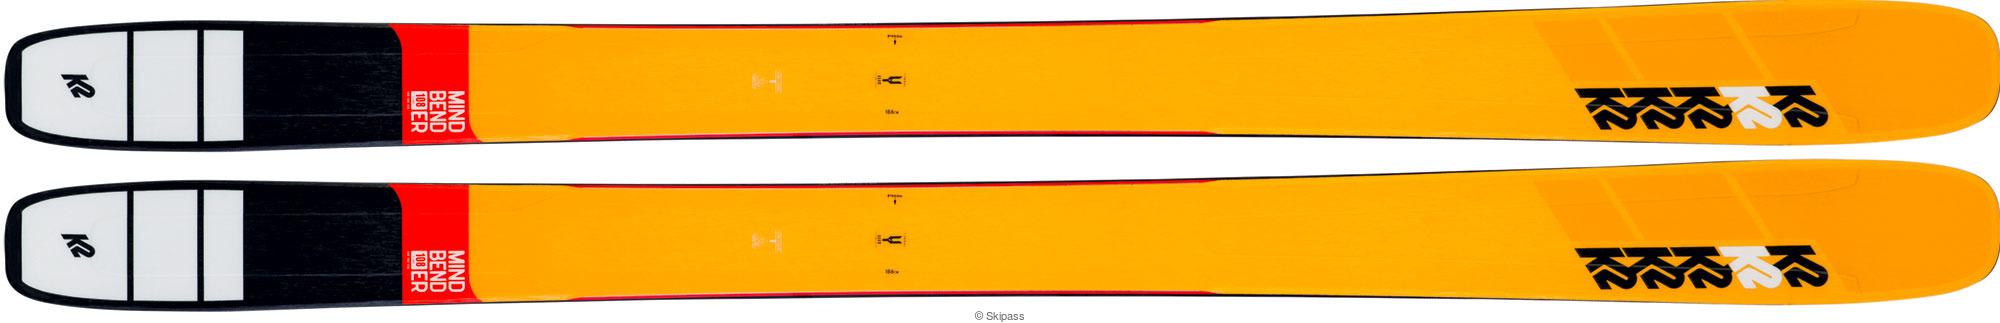 K2 Mindbender 108 Ti